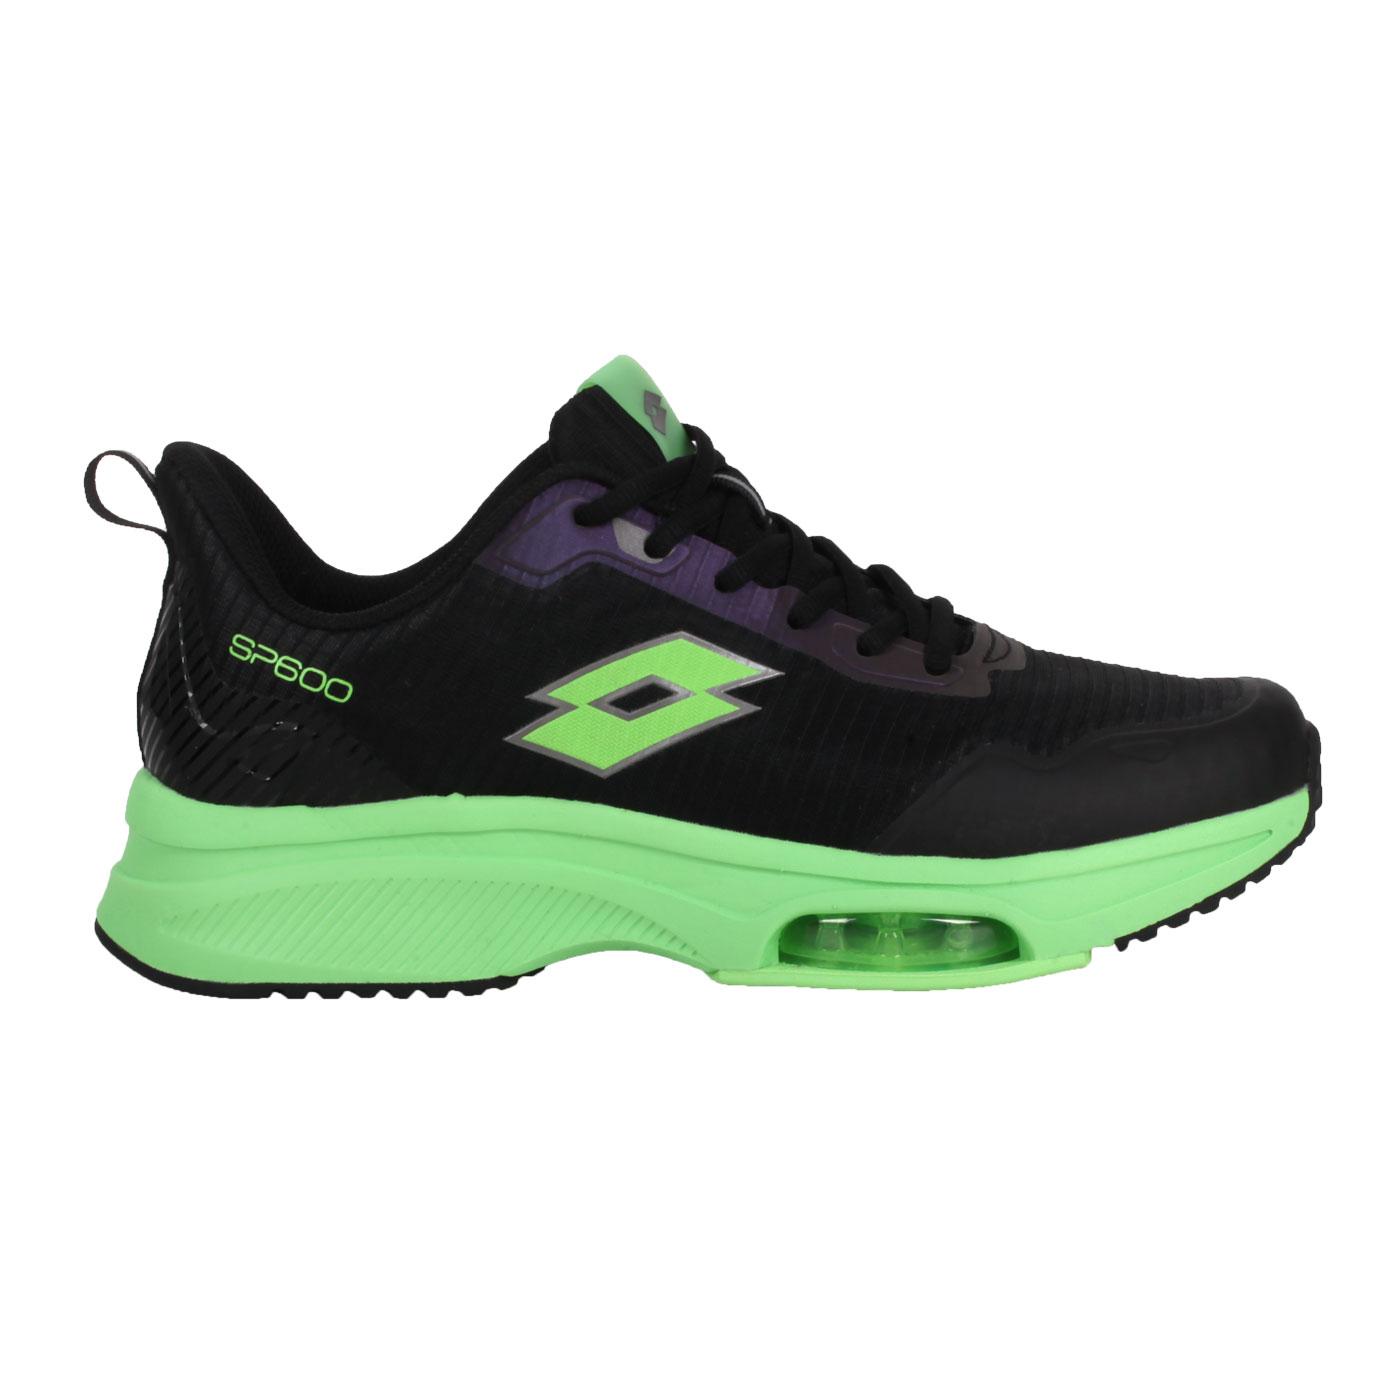 LOTTO 男款前掌氣墊跑鞋 LT1AMR3015 - 黑綠